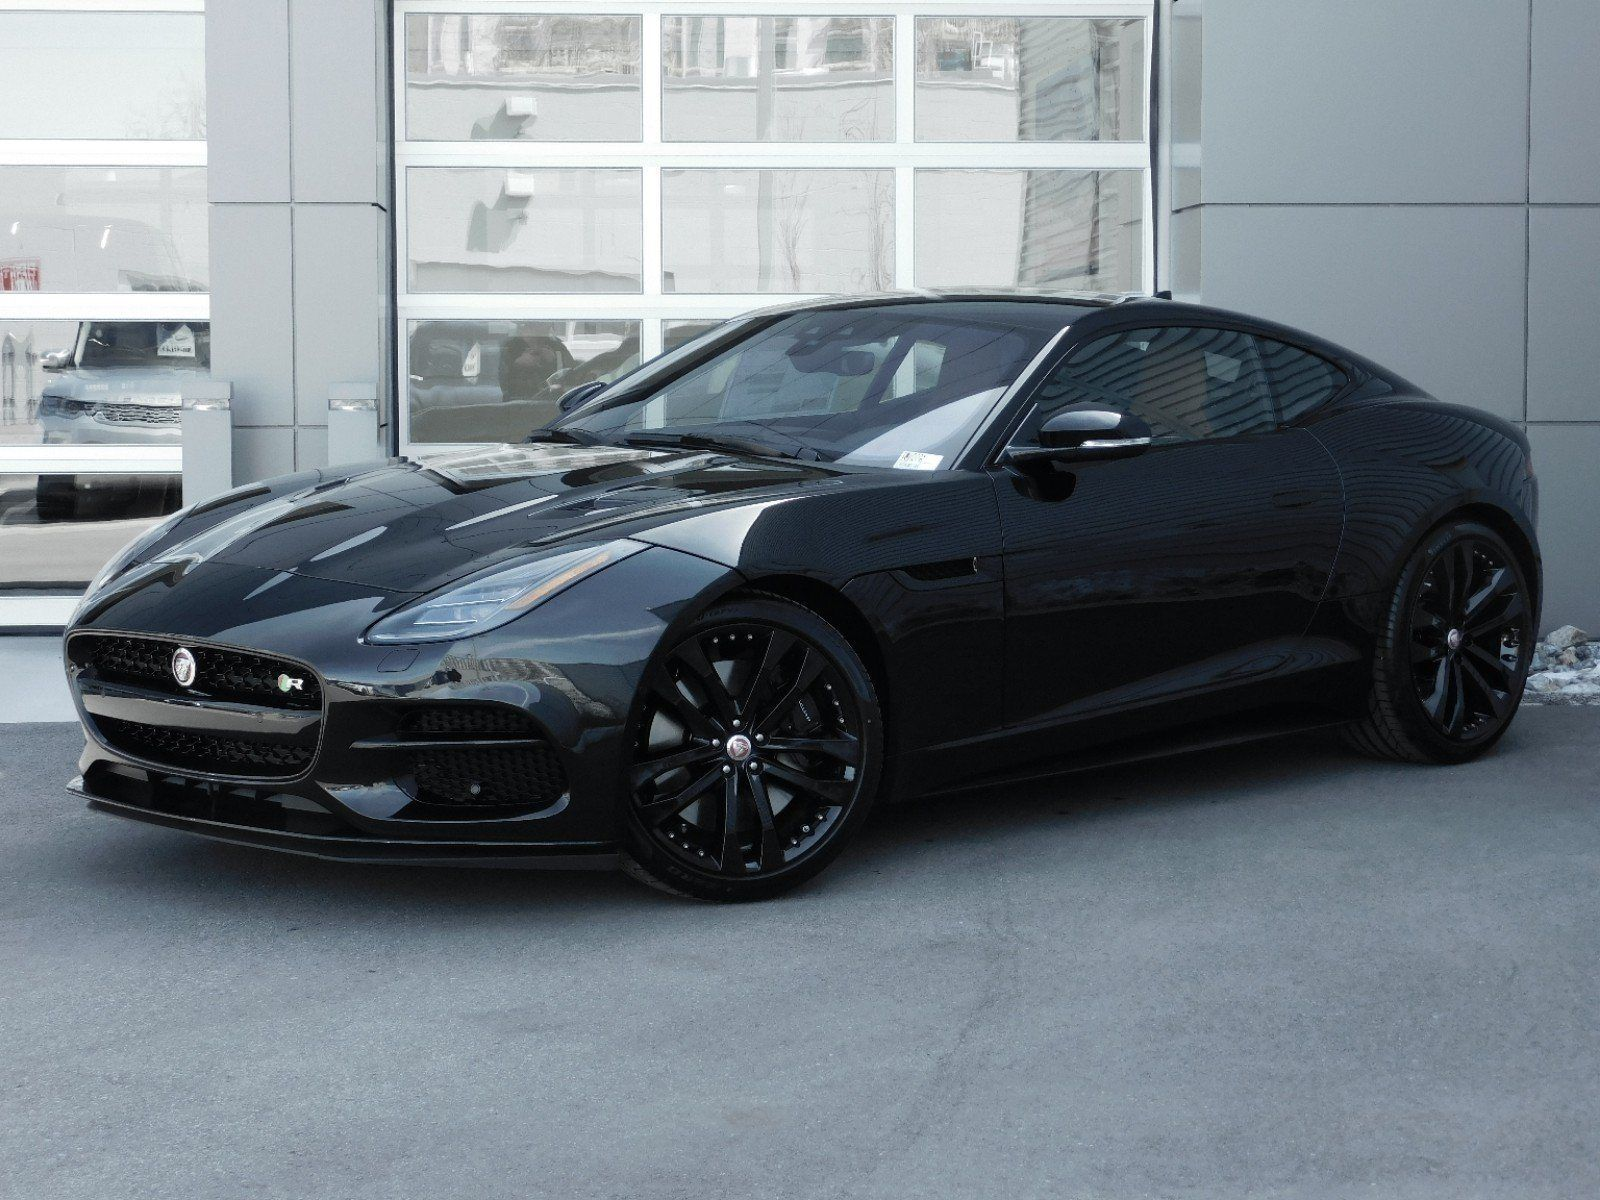 2020 Jaguar Xj Coupe Spy Shoot